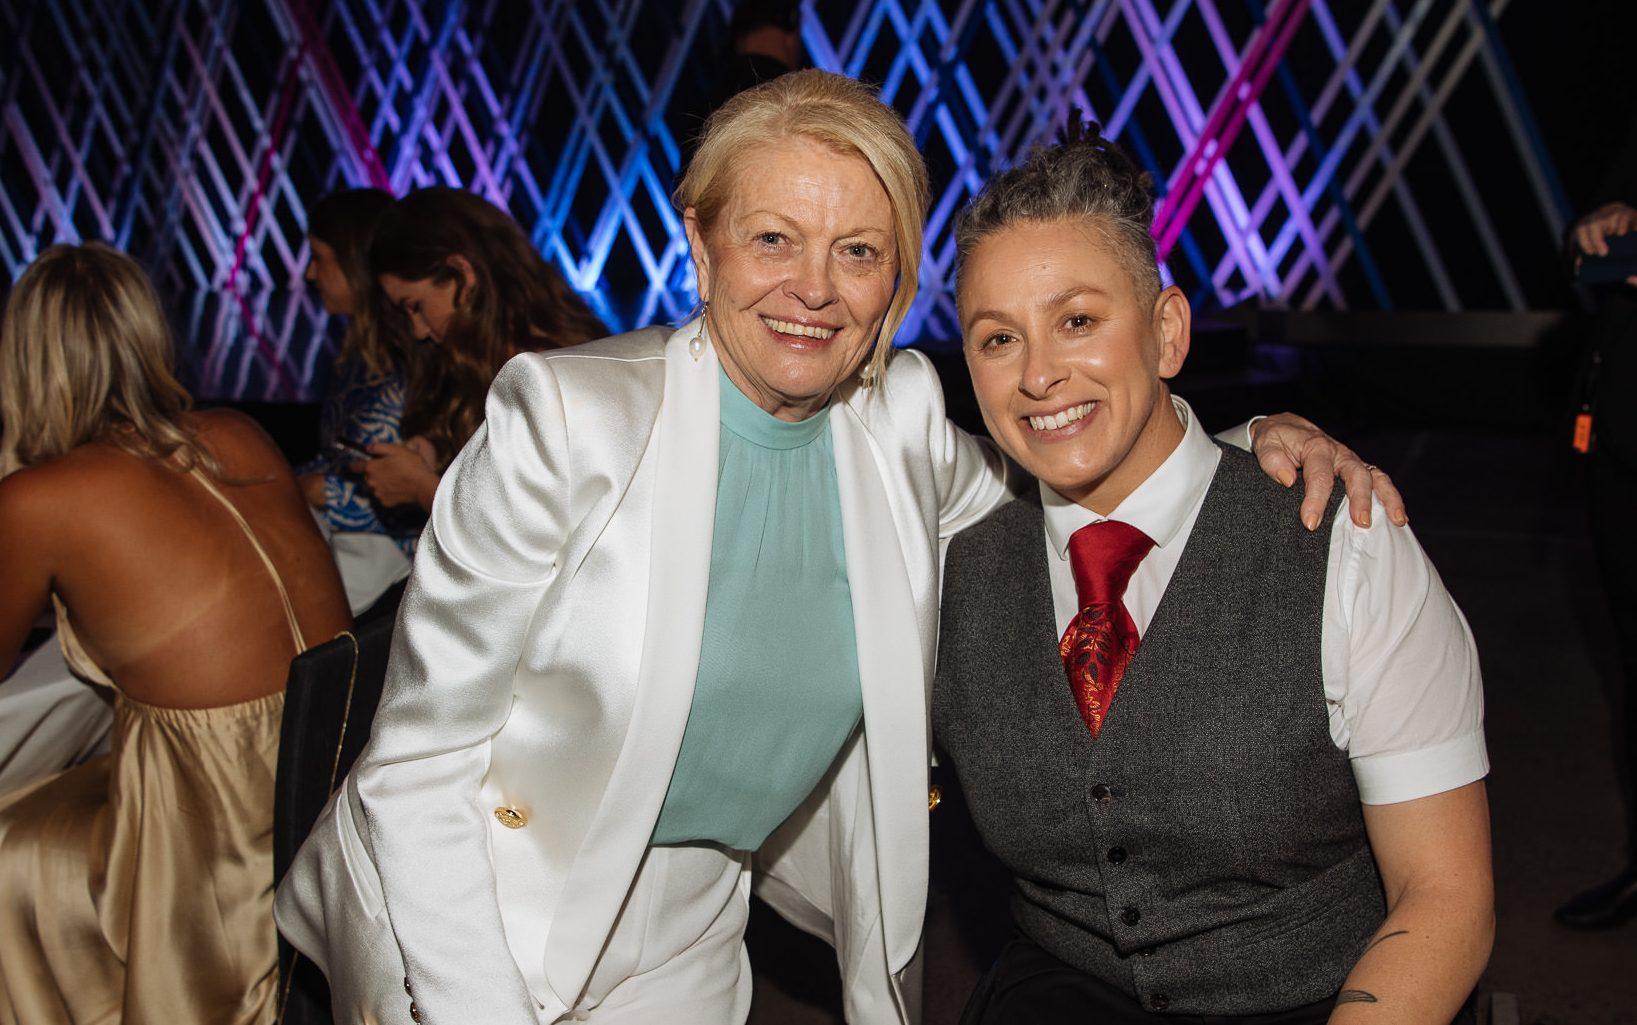 Paralympics Australia honoured by IPC on International Women's Day